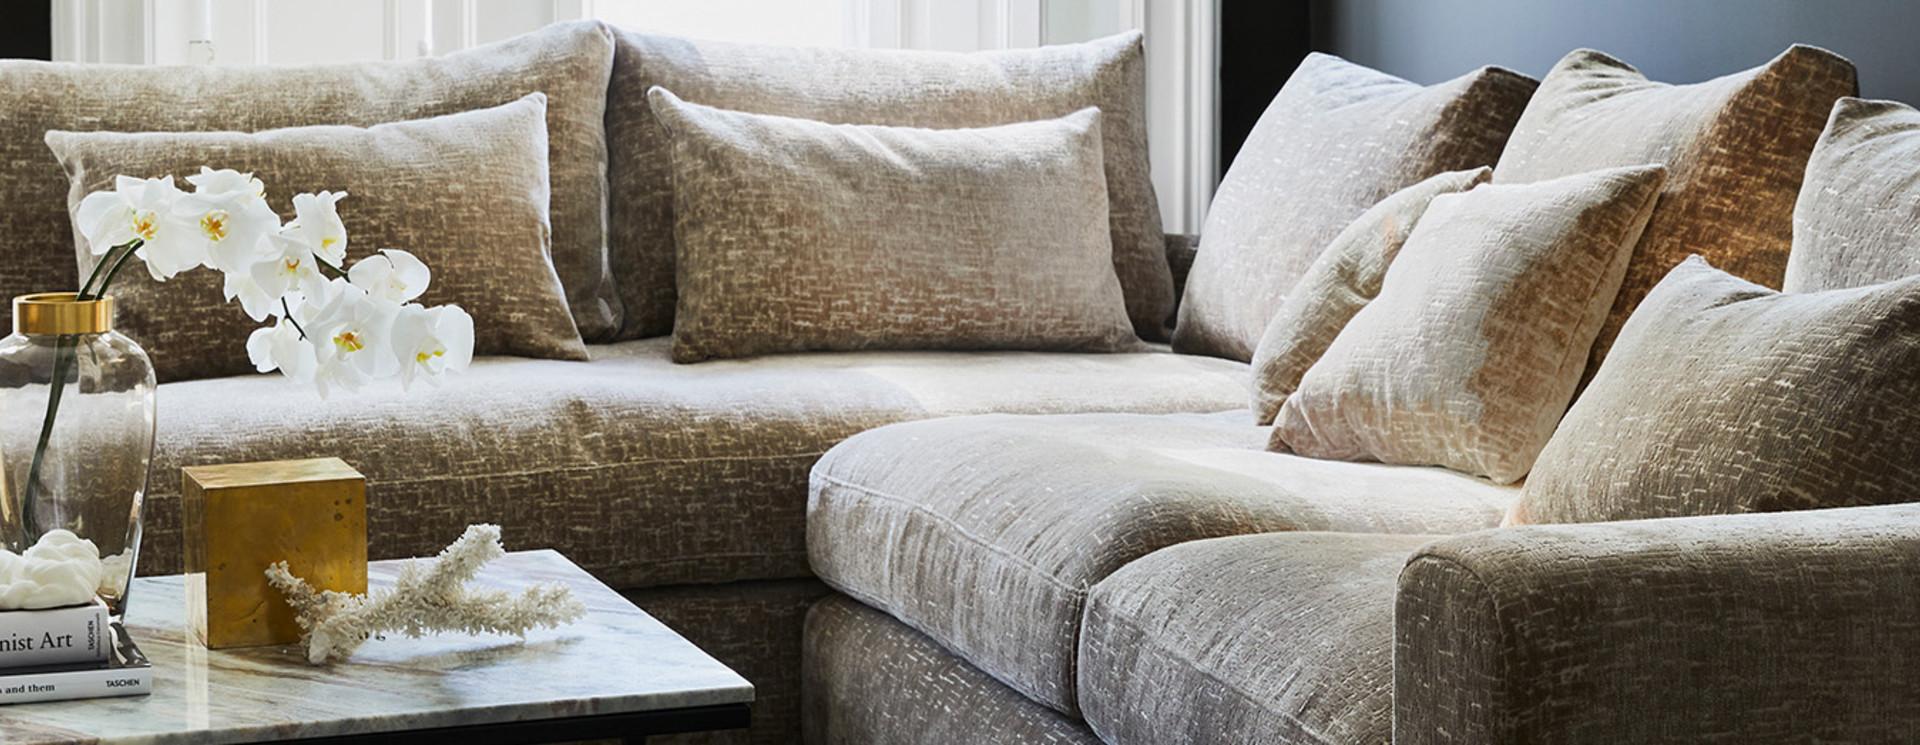 Elegant Park sofa